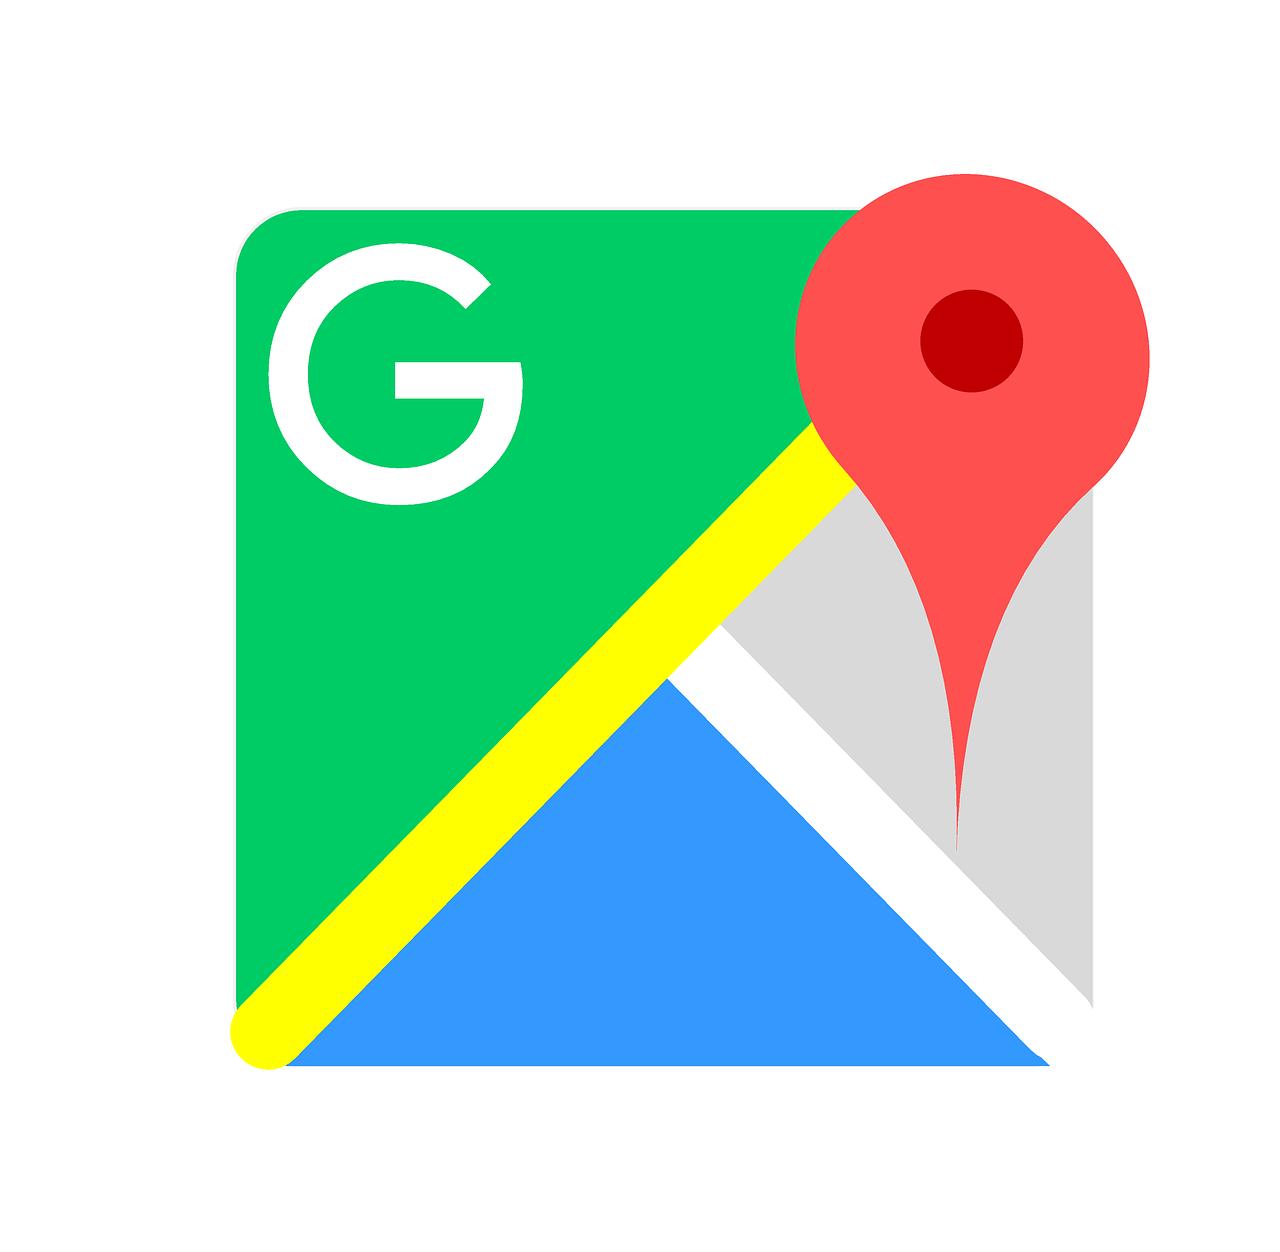 Lokale Suchmaschinenoptimierung Google Maps integrieren